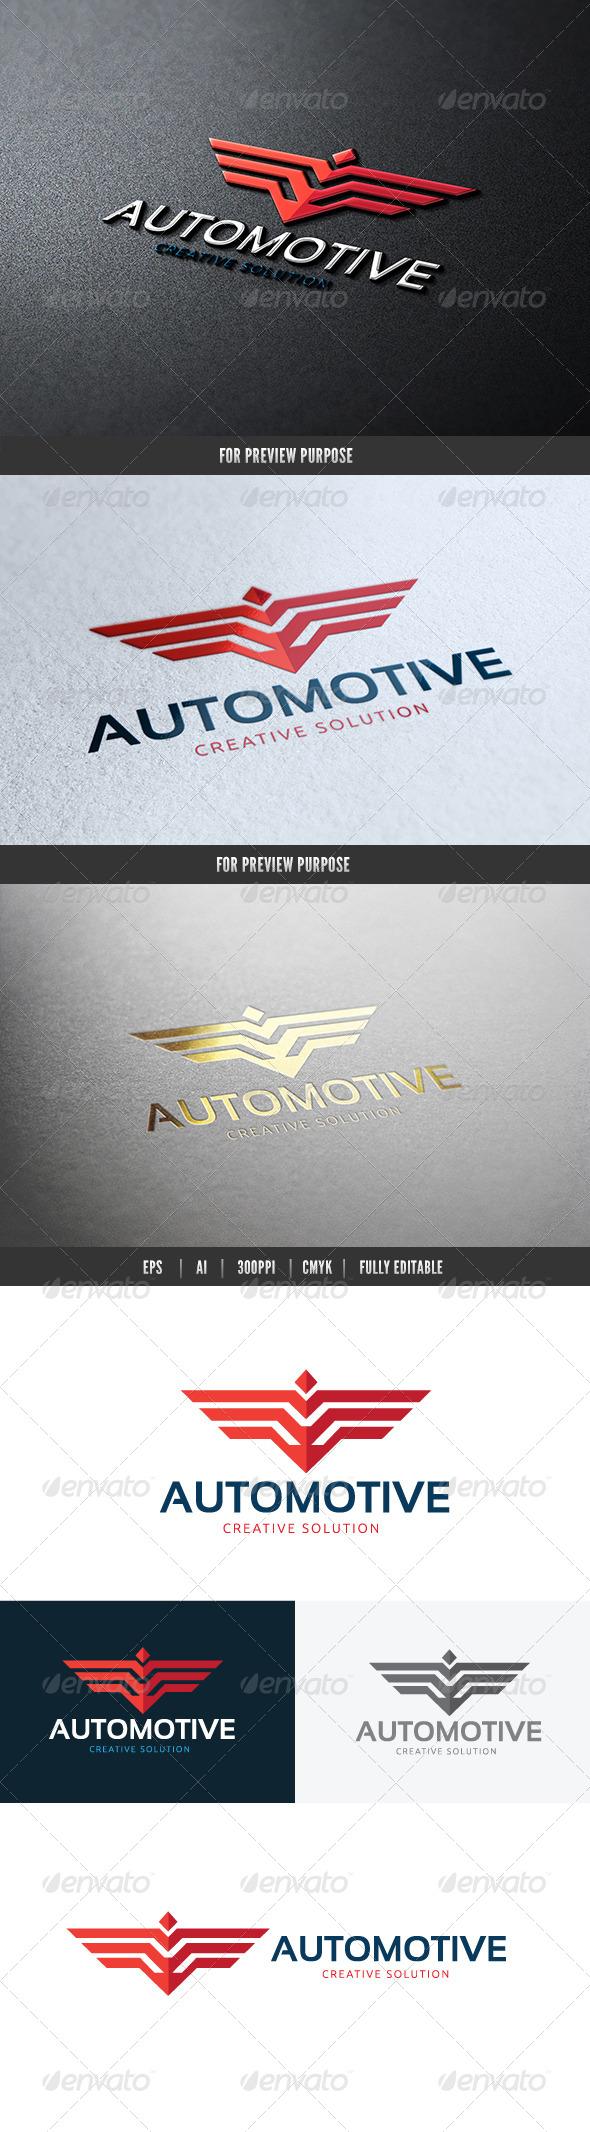 Automotive Creative Solution Logo - Animals Logo Templates